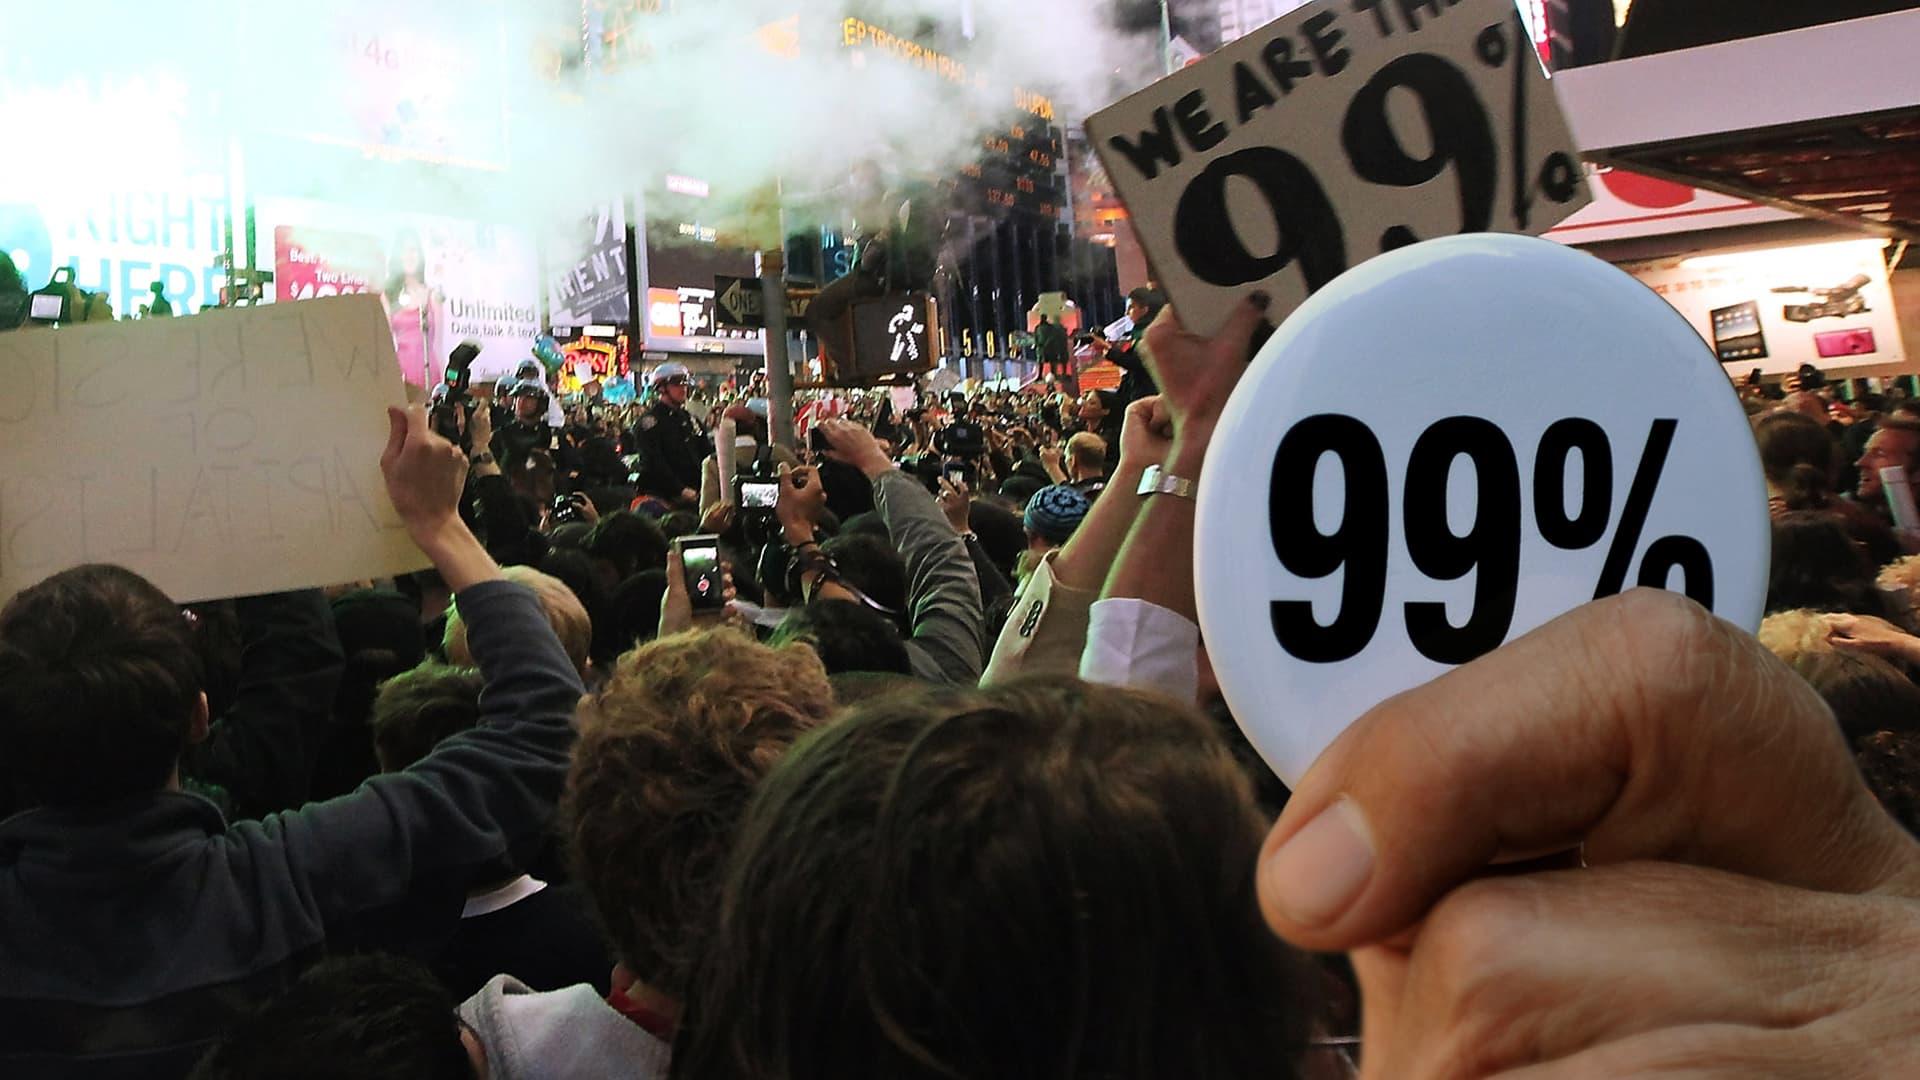 UK heading toward the 'damaging' inequality seen in the US, Nobel Prize winner warns